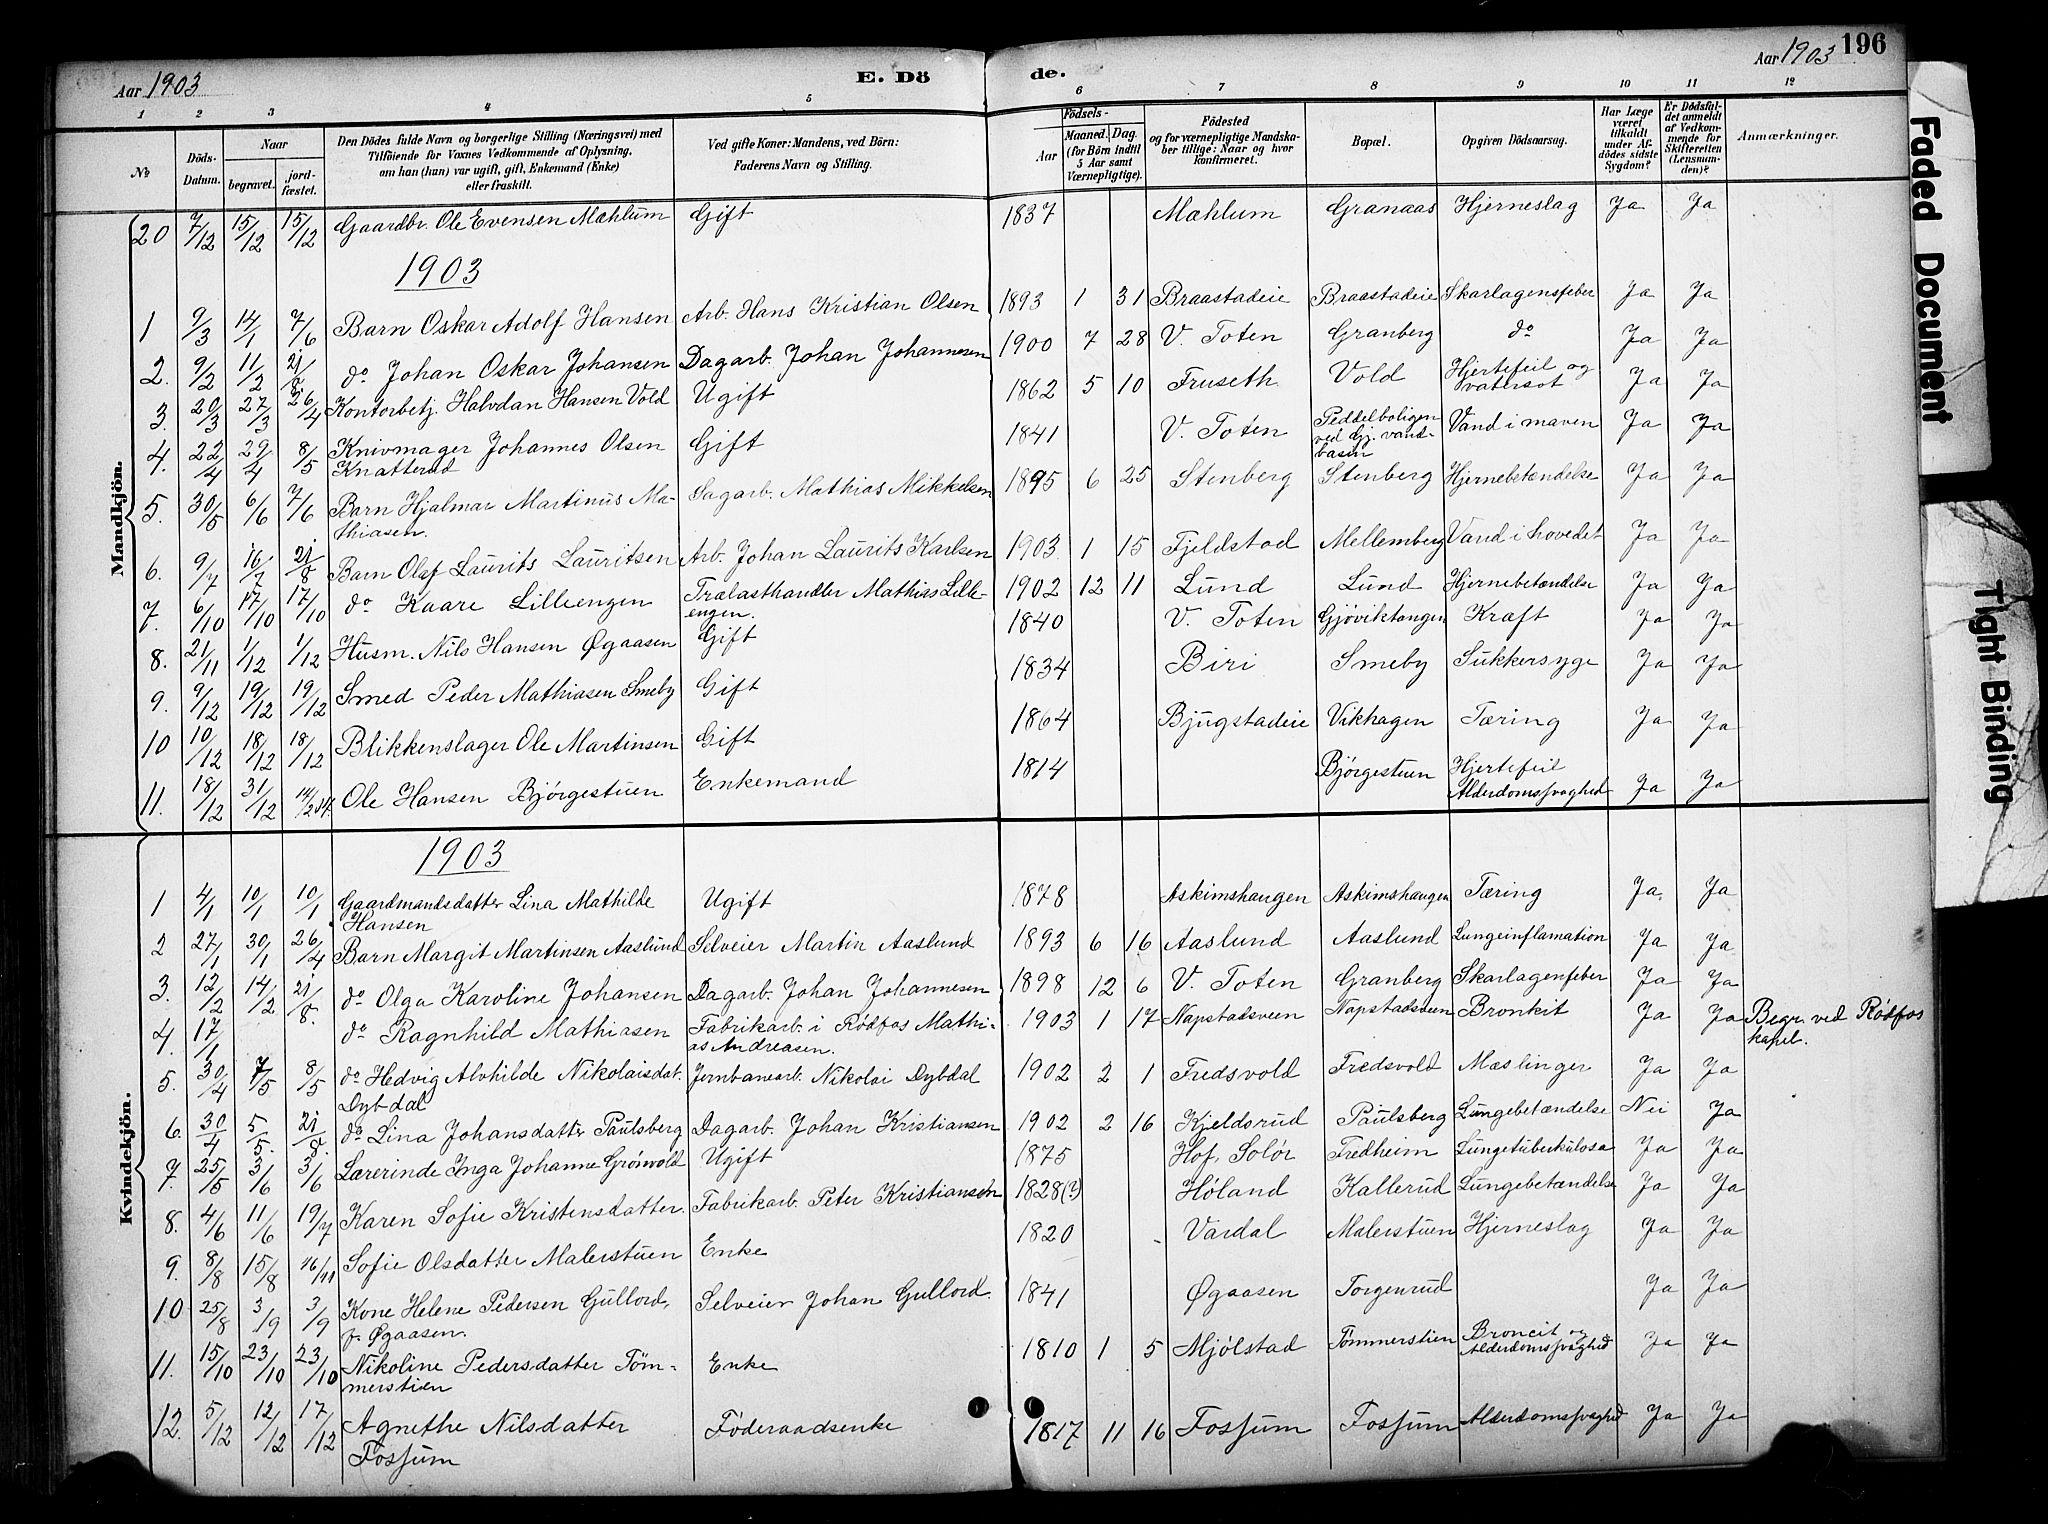 SAH, Vardal prestekontor, H/Ha/Haa/L0012: Ministerialbok nr. 12, 1893-1904, s. 196